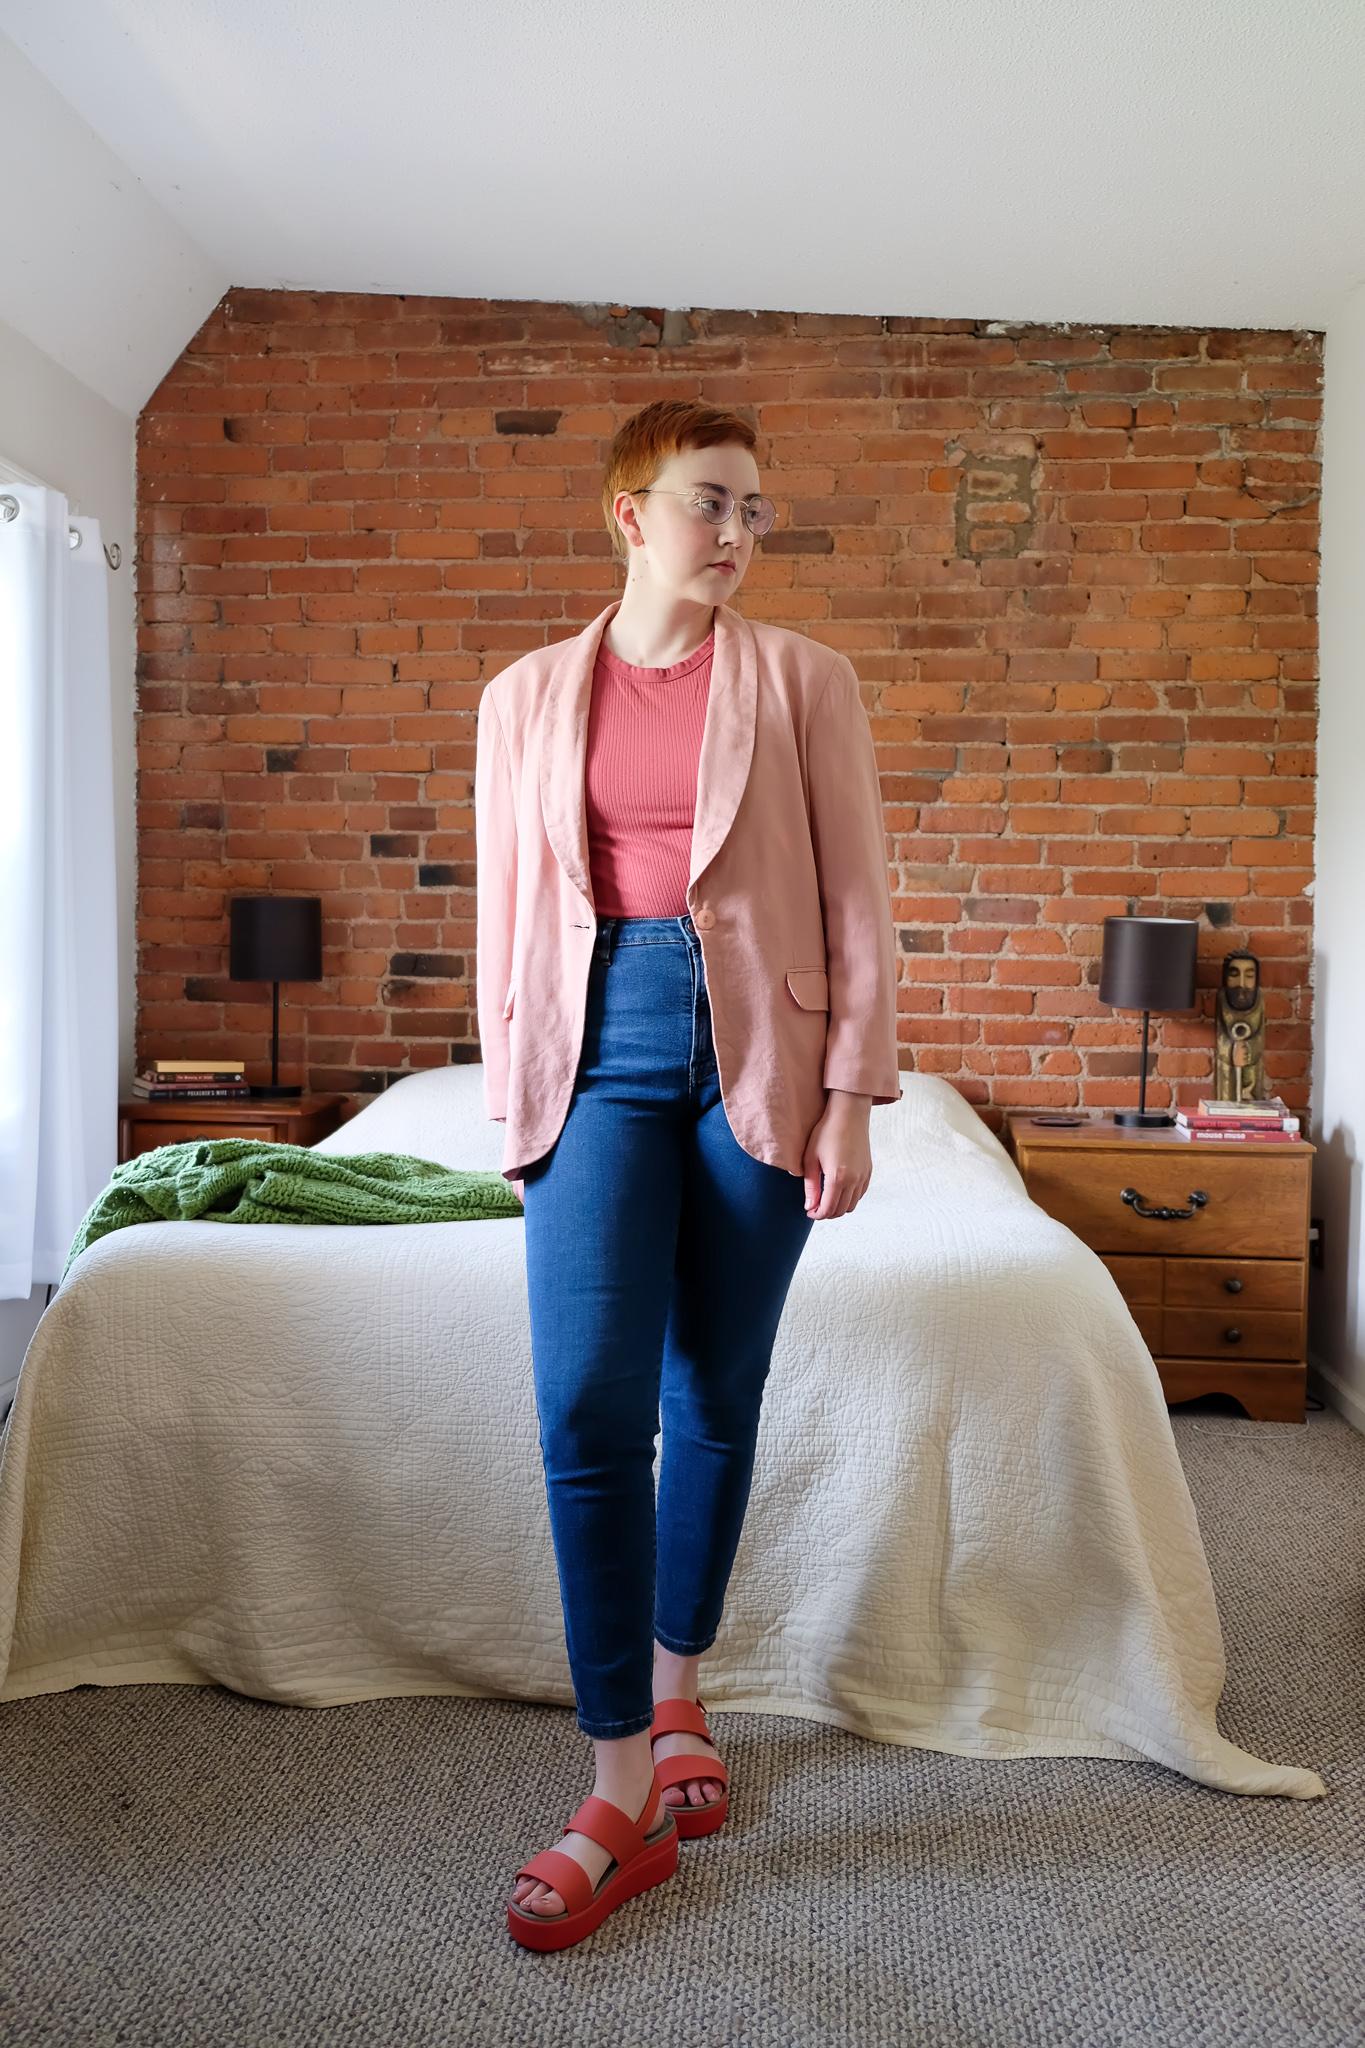 A Thrifted Pink Blazer